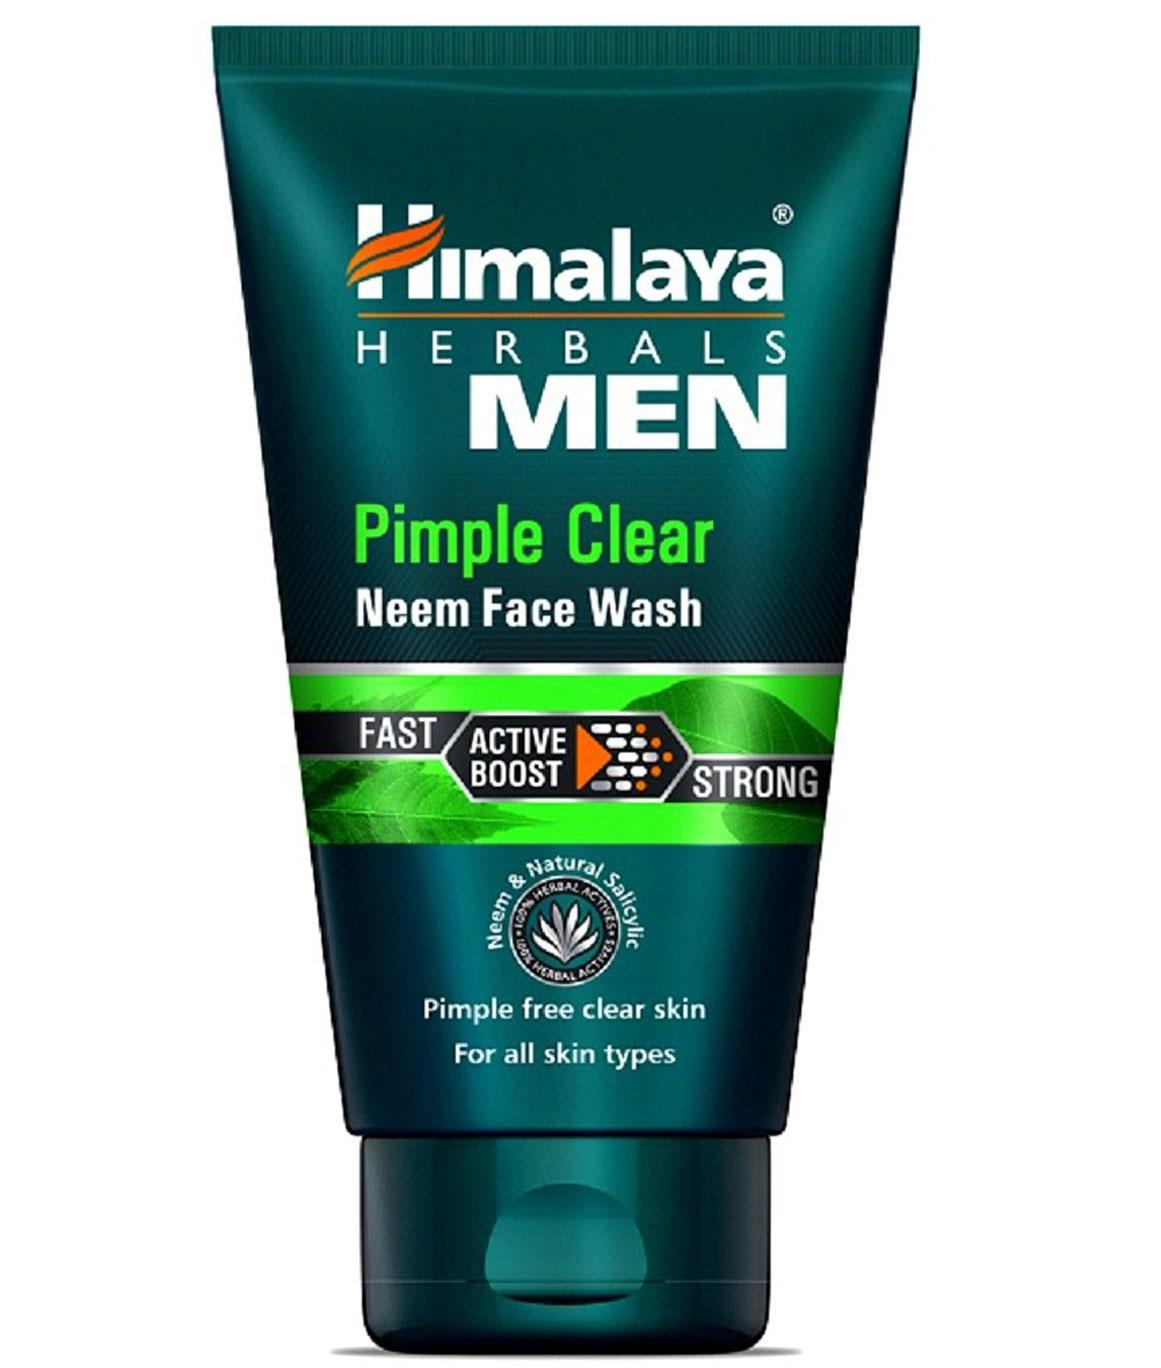 Himalaya Men Pimple Clear Neem Face Wash 50ml